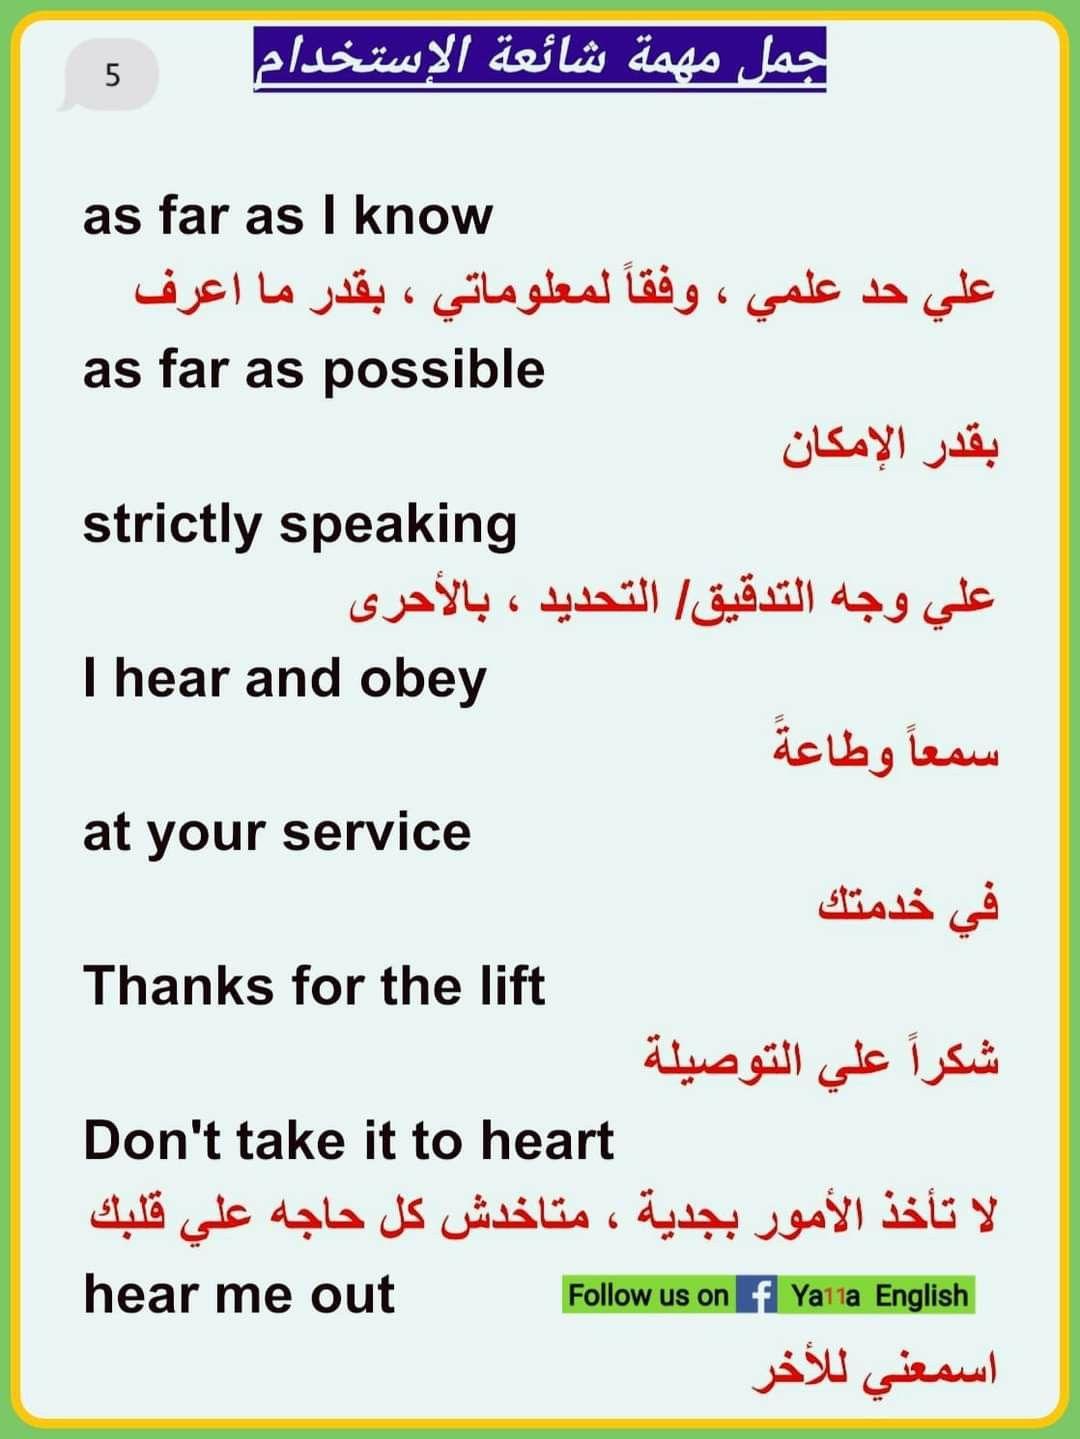 عبارات مهمة جدا Thankful English Obey